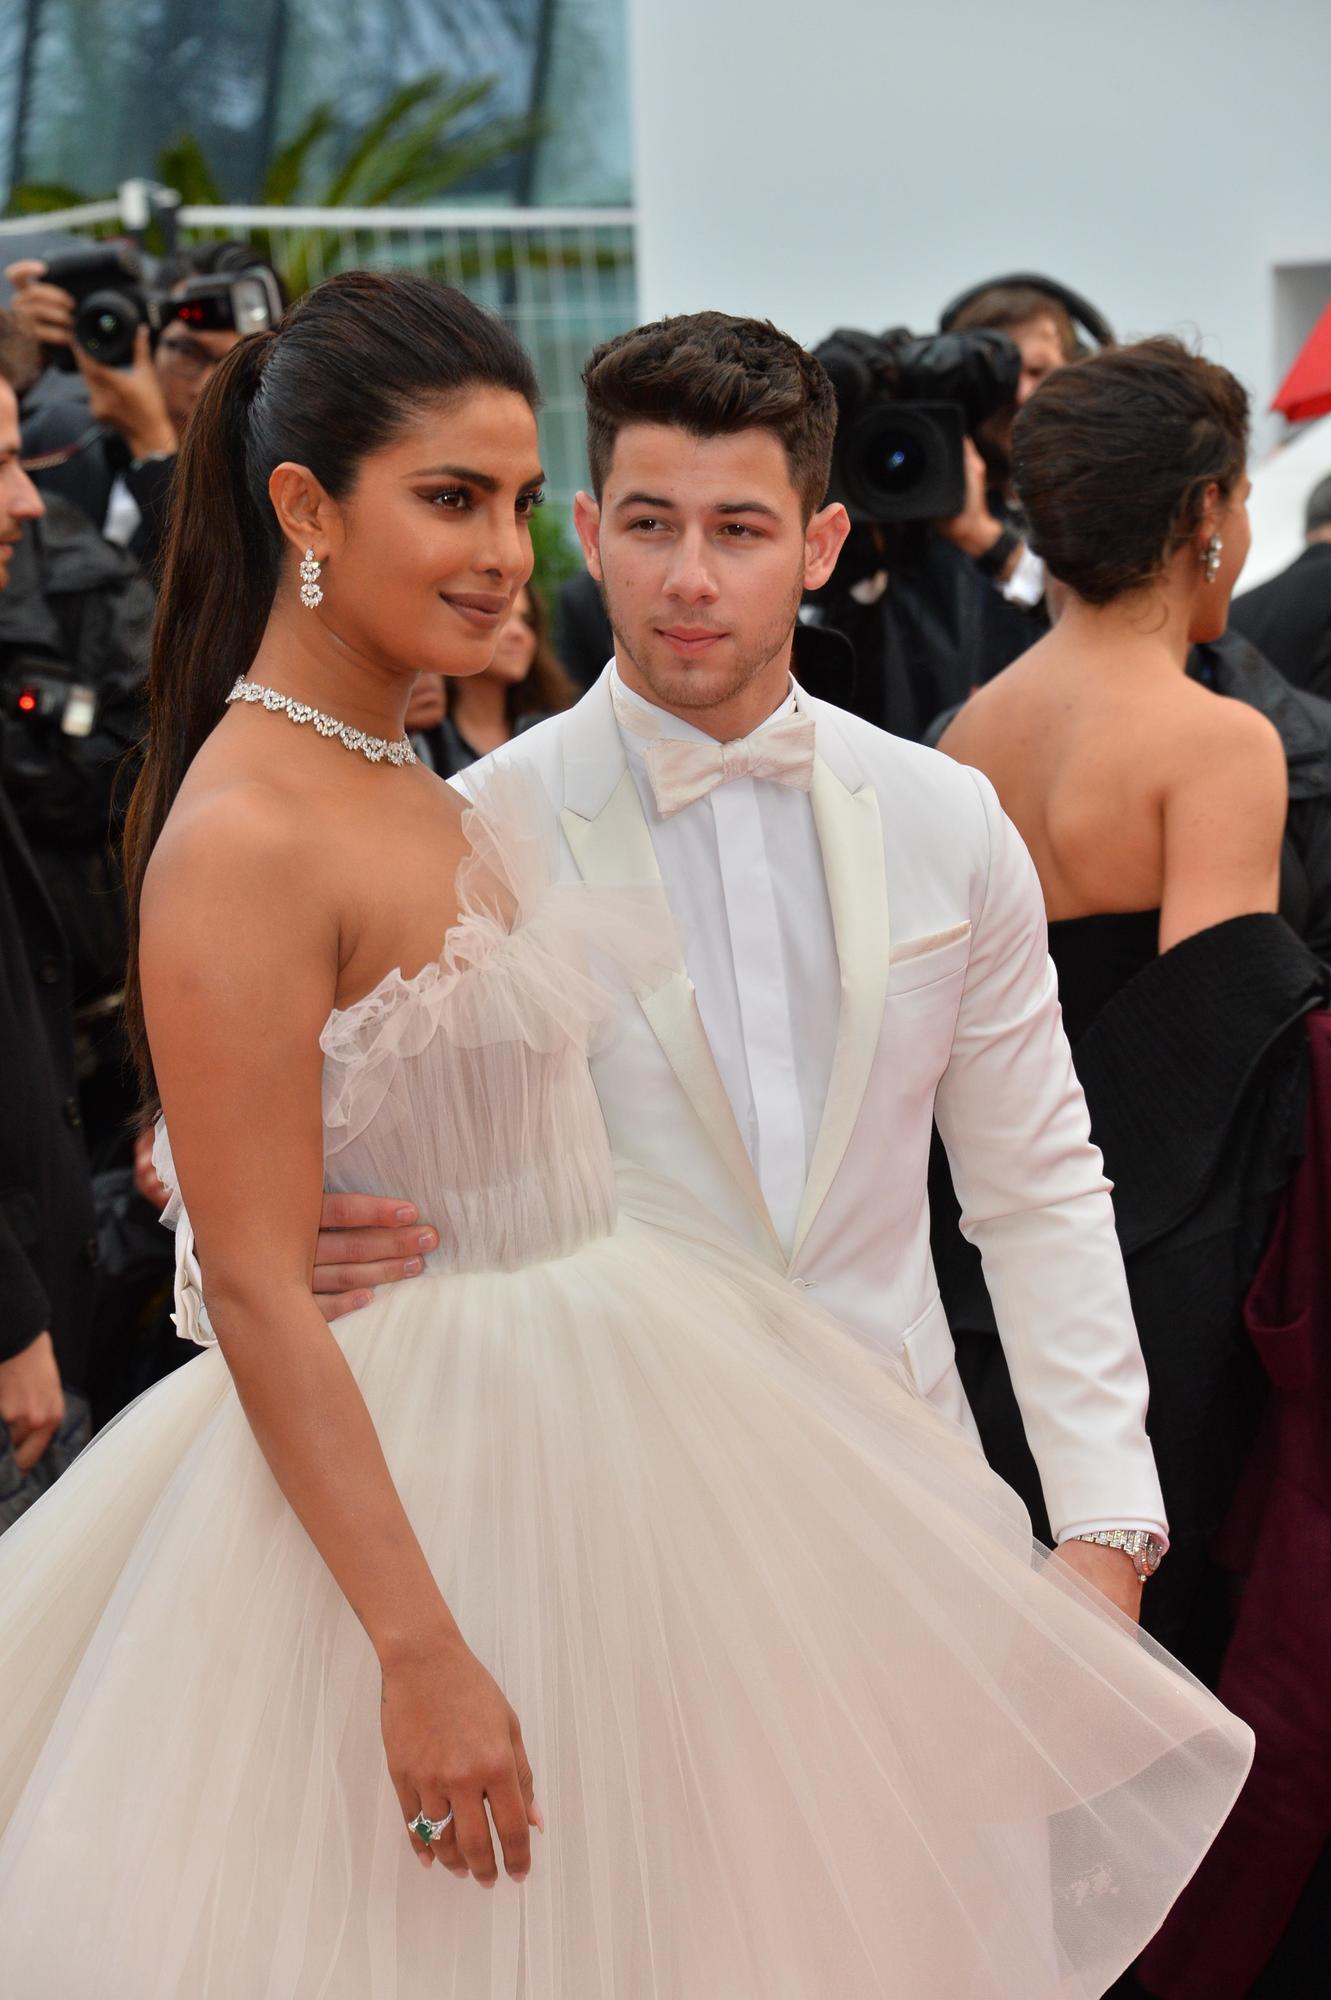 Priyanka Chopra And Nick Jonas Celebrated Their Anniversary In The Sweetest Of Ways